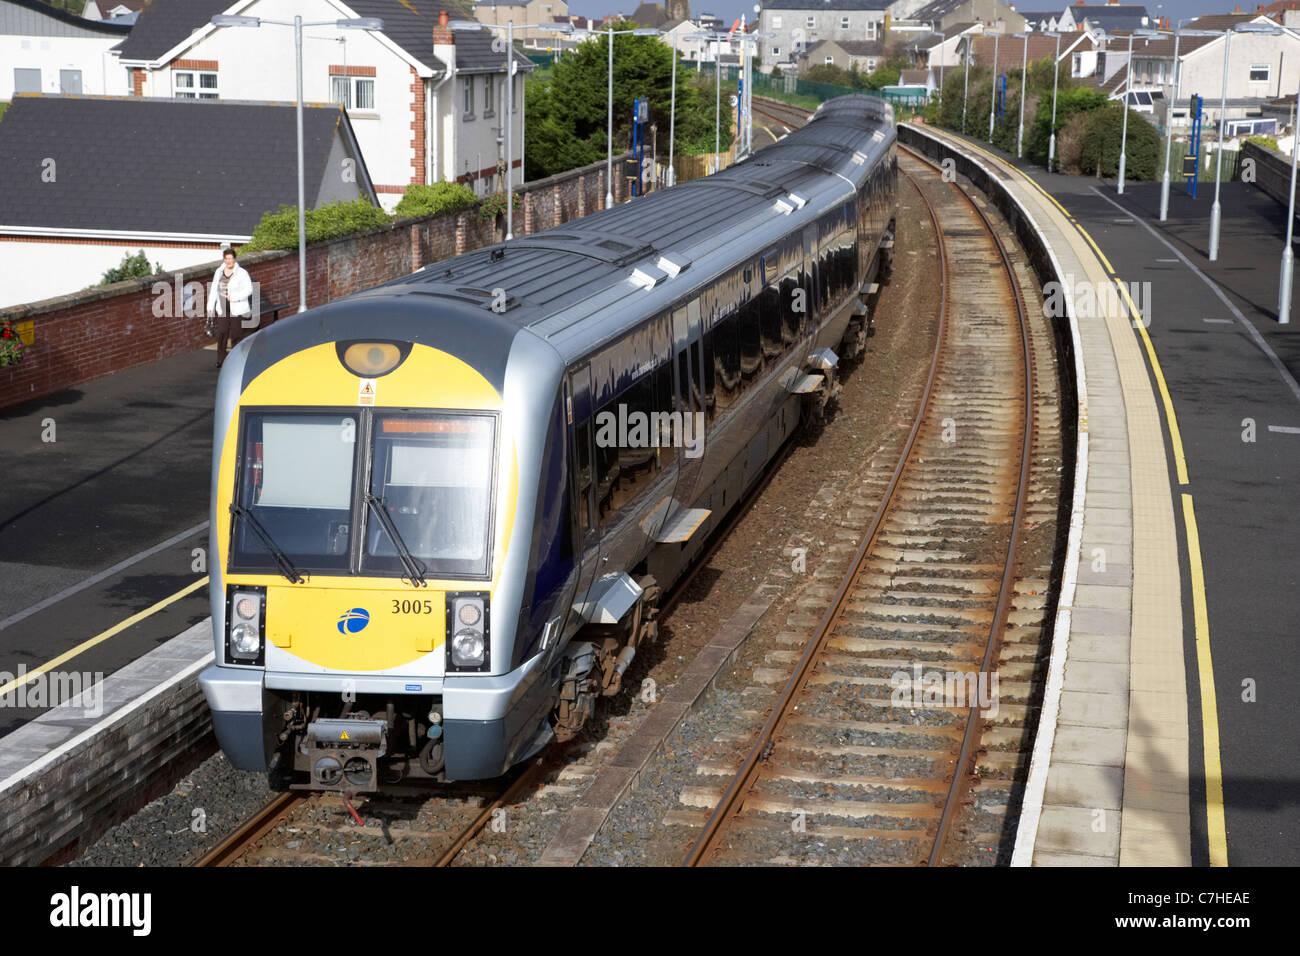 northern ireland railways passenger train at castlerock railway station northern ireland uk - Stock Image